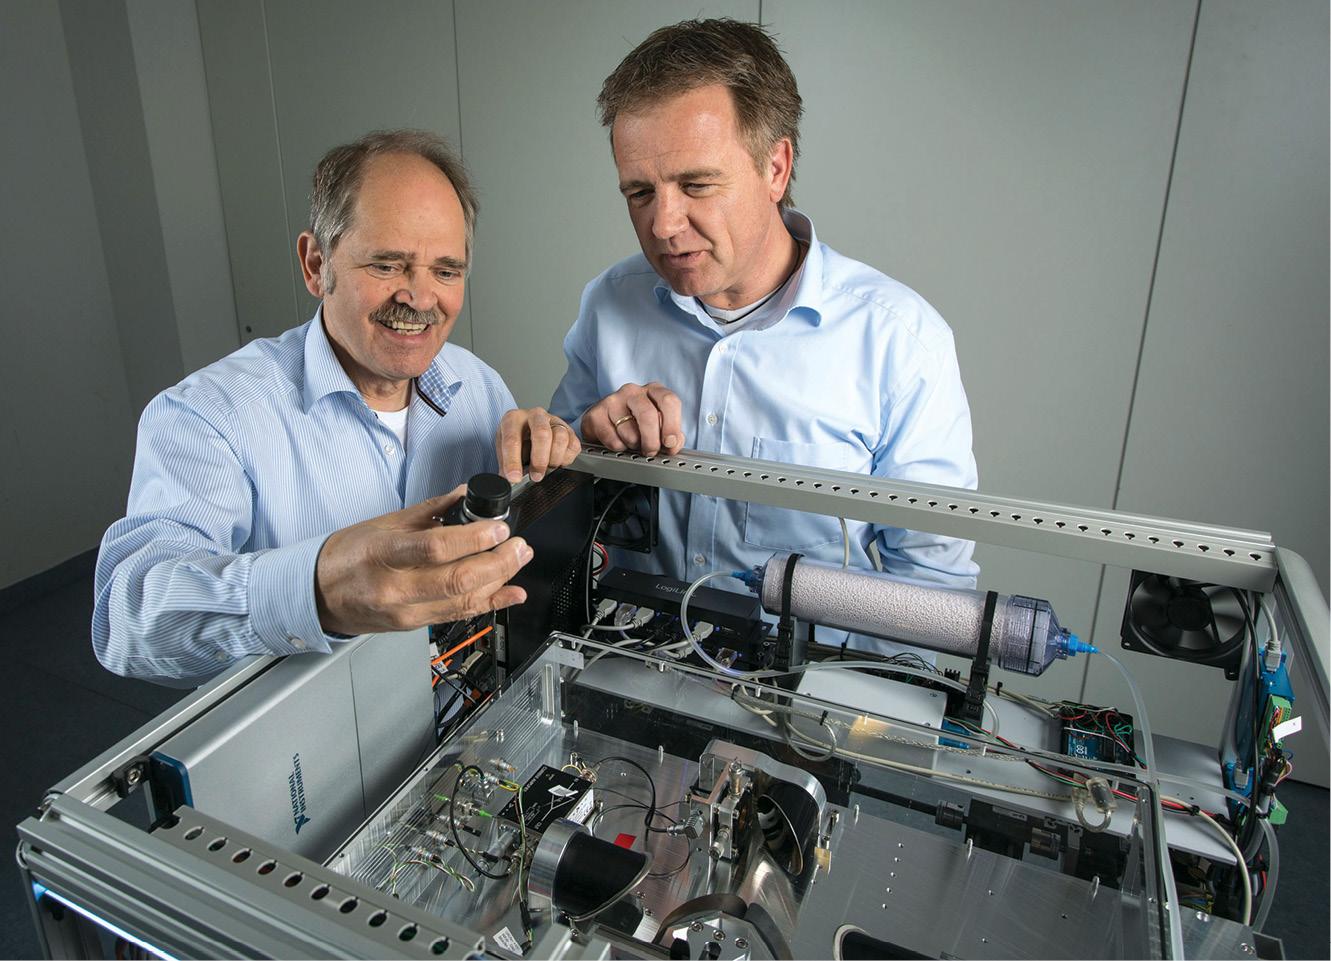 The inventors with their terahertz scanner (Courtesy: Fraunhofer Institute)